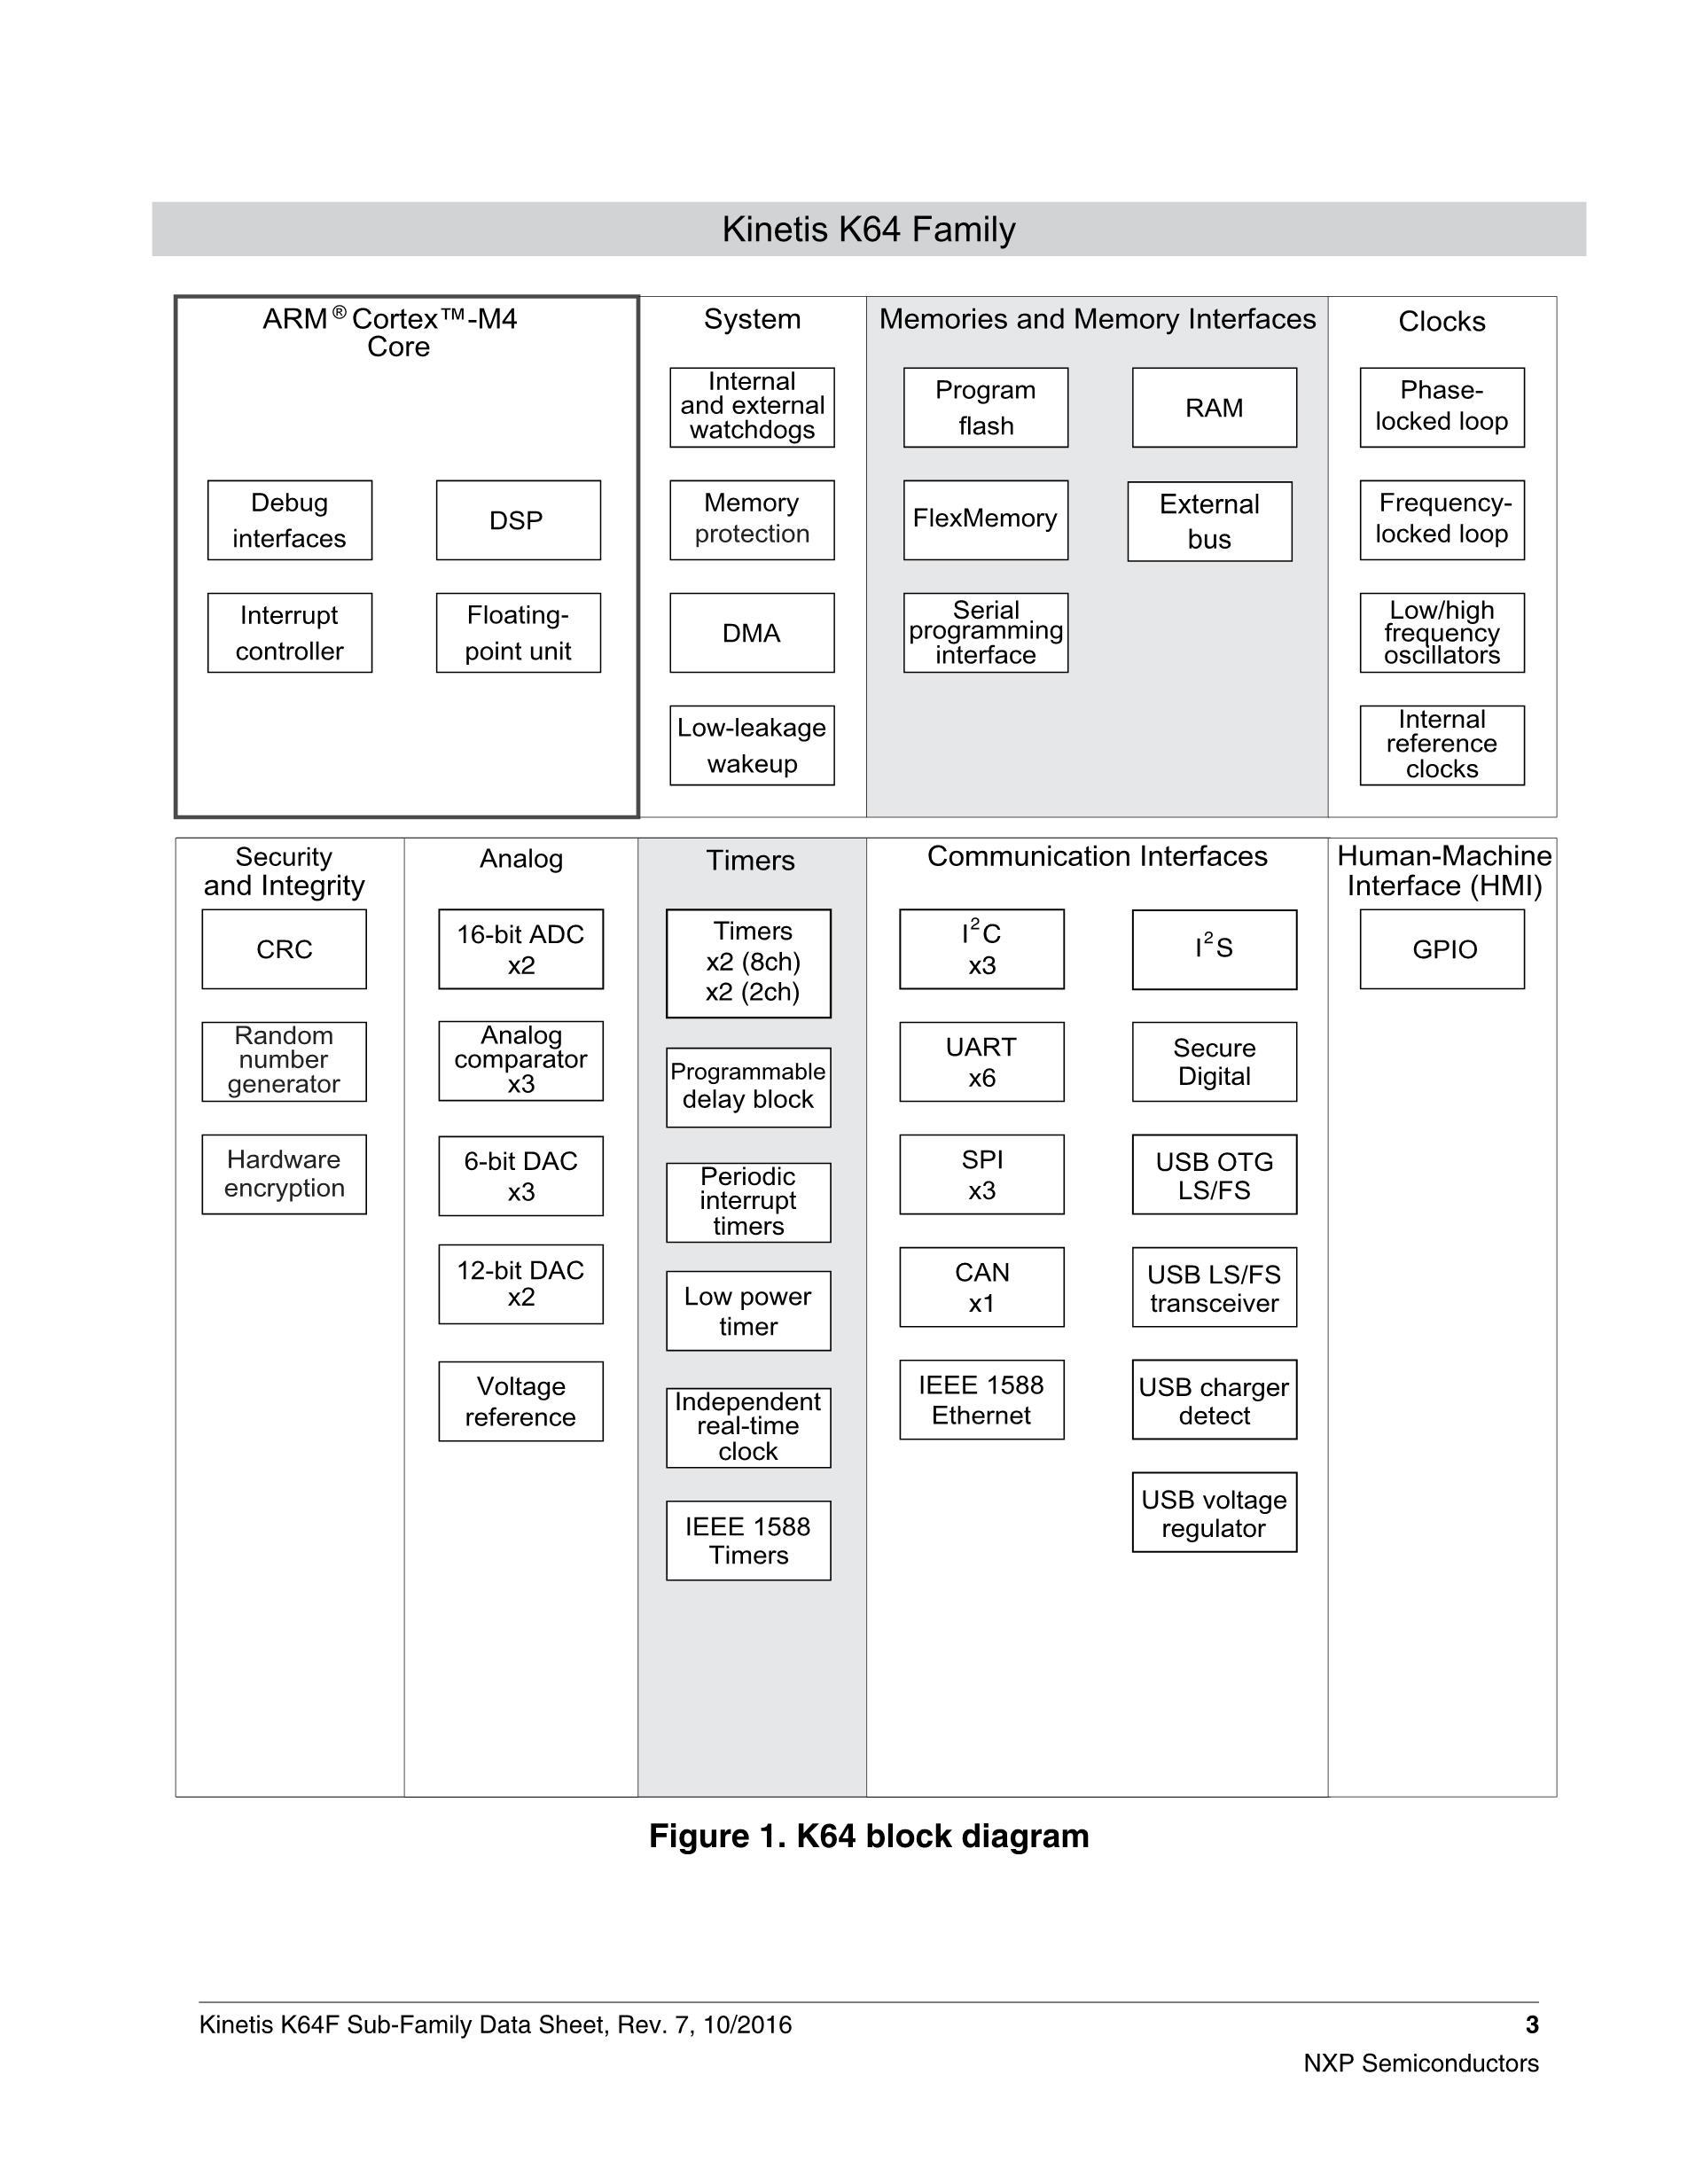 12.0000C MHZ 2PT's pdf picture 3